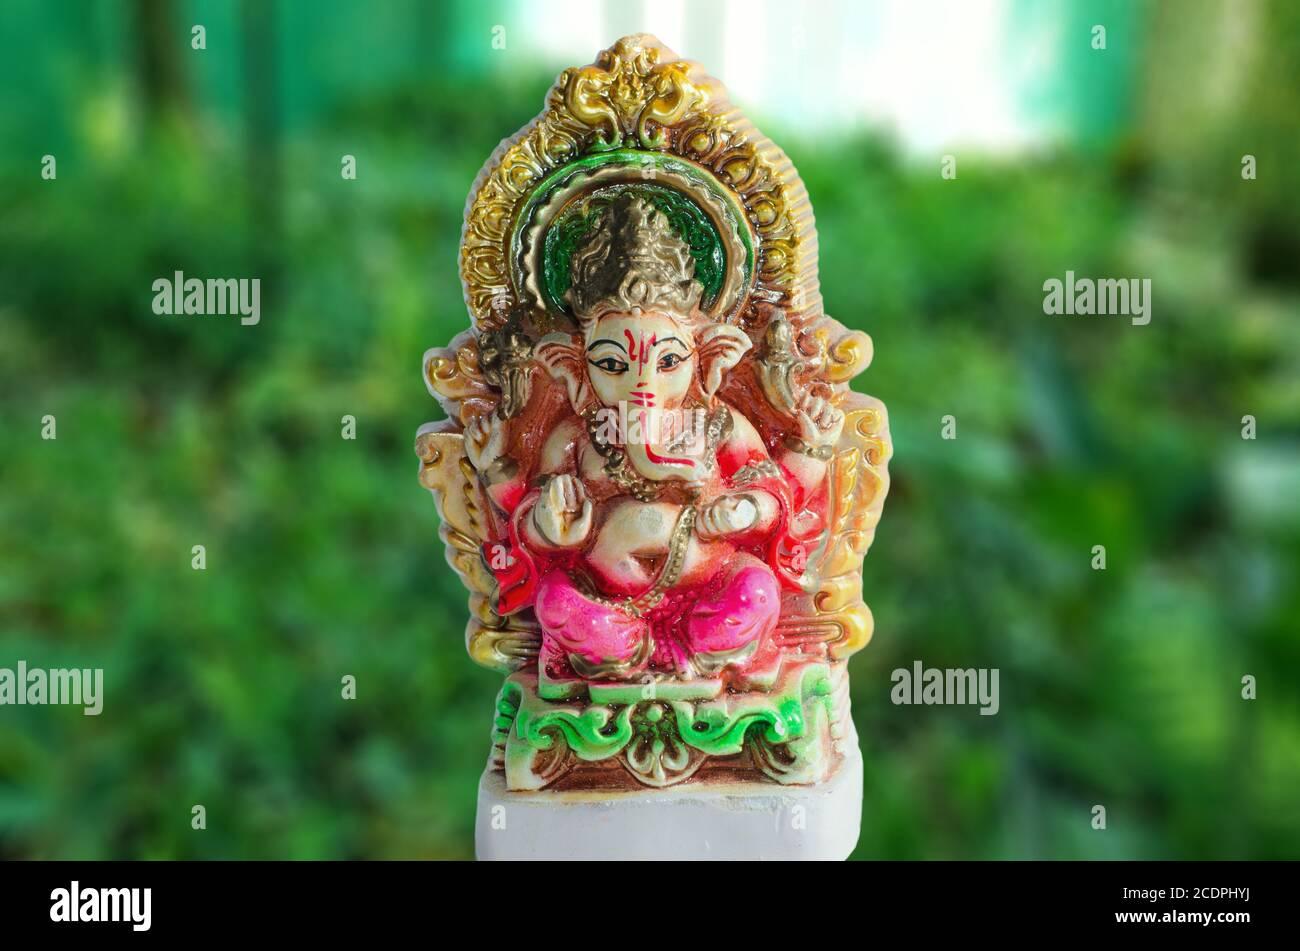 Celebrating the Festival of Lord Ganesha Stock Photo